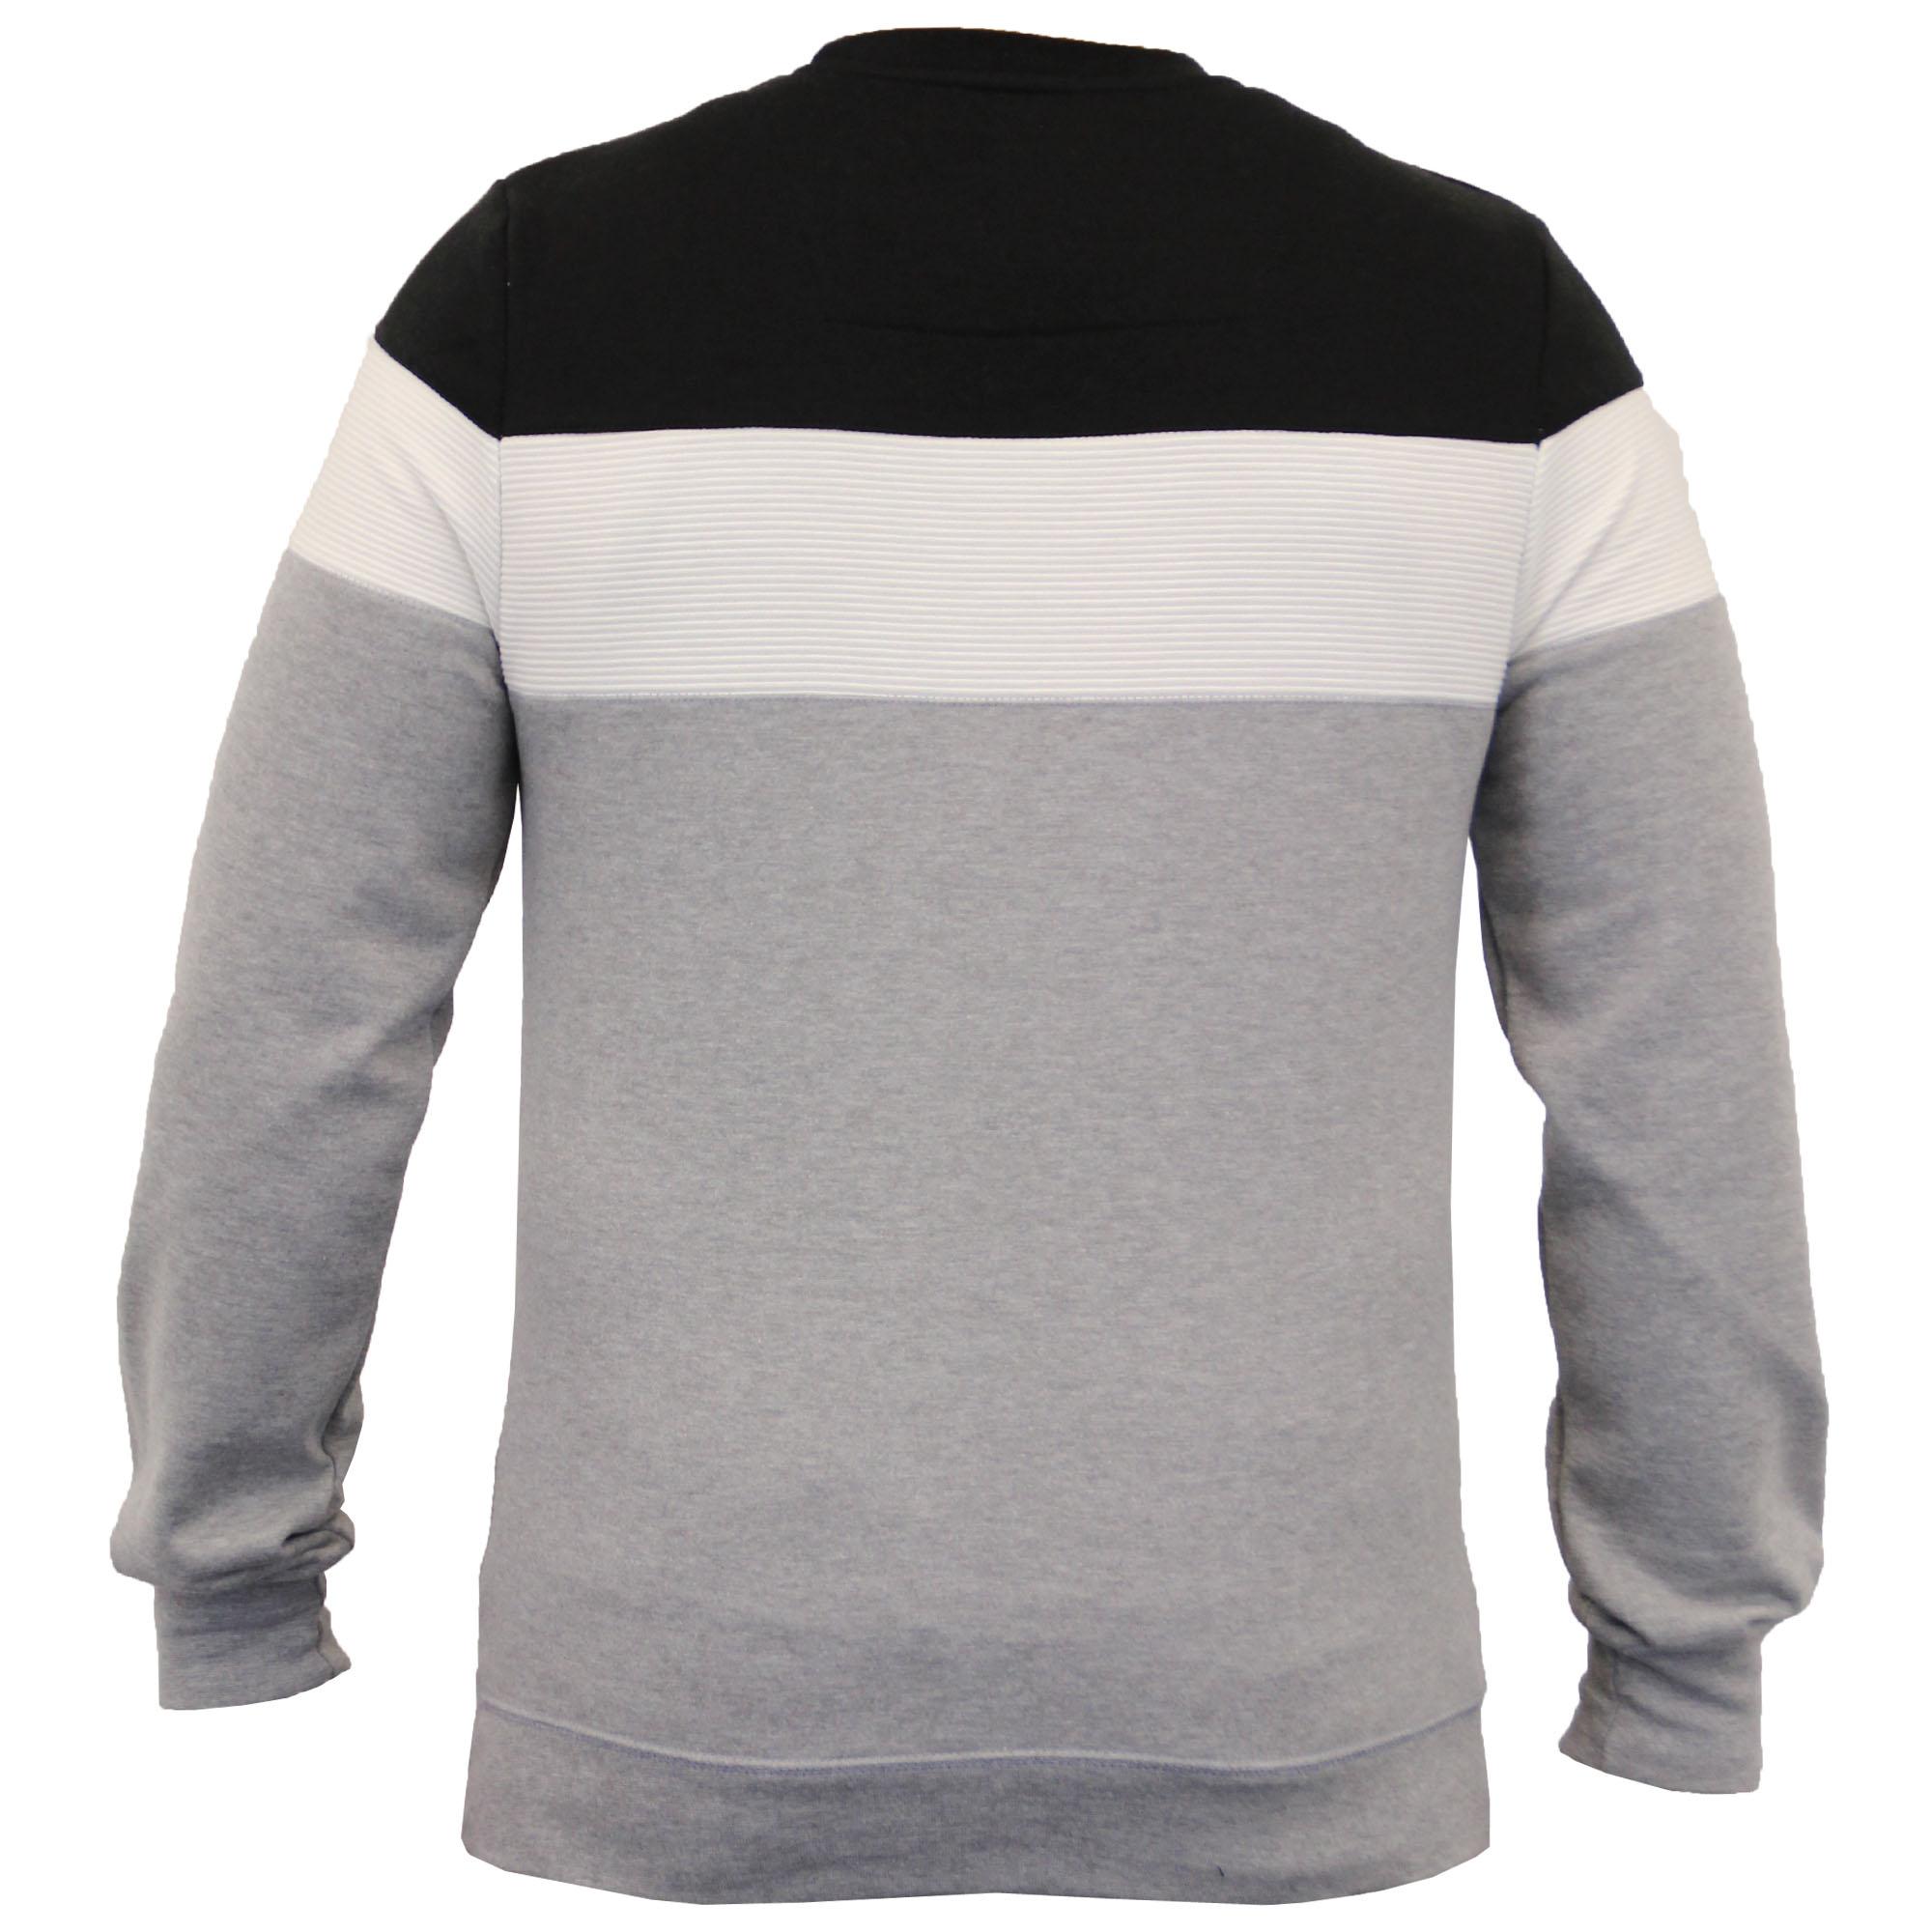 Mens-Sweatshirt-Threadbare-Pullover-Top-Block-Pattern-Fleece-Lined-Winter-New thumbnail 3